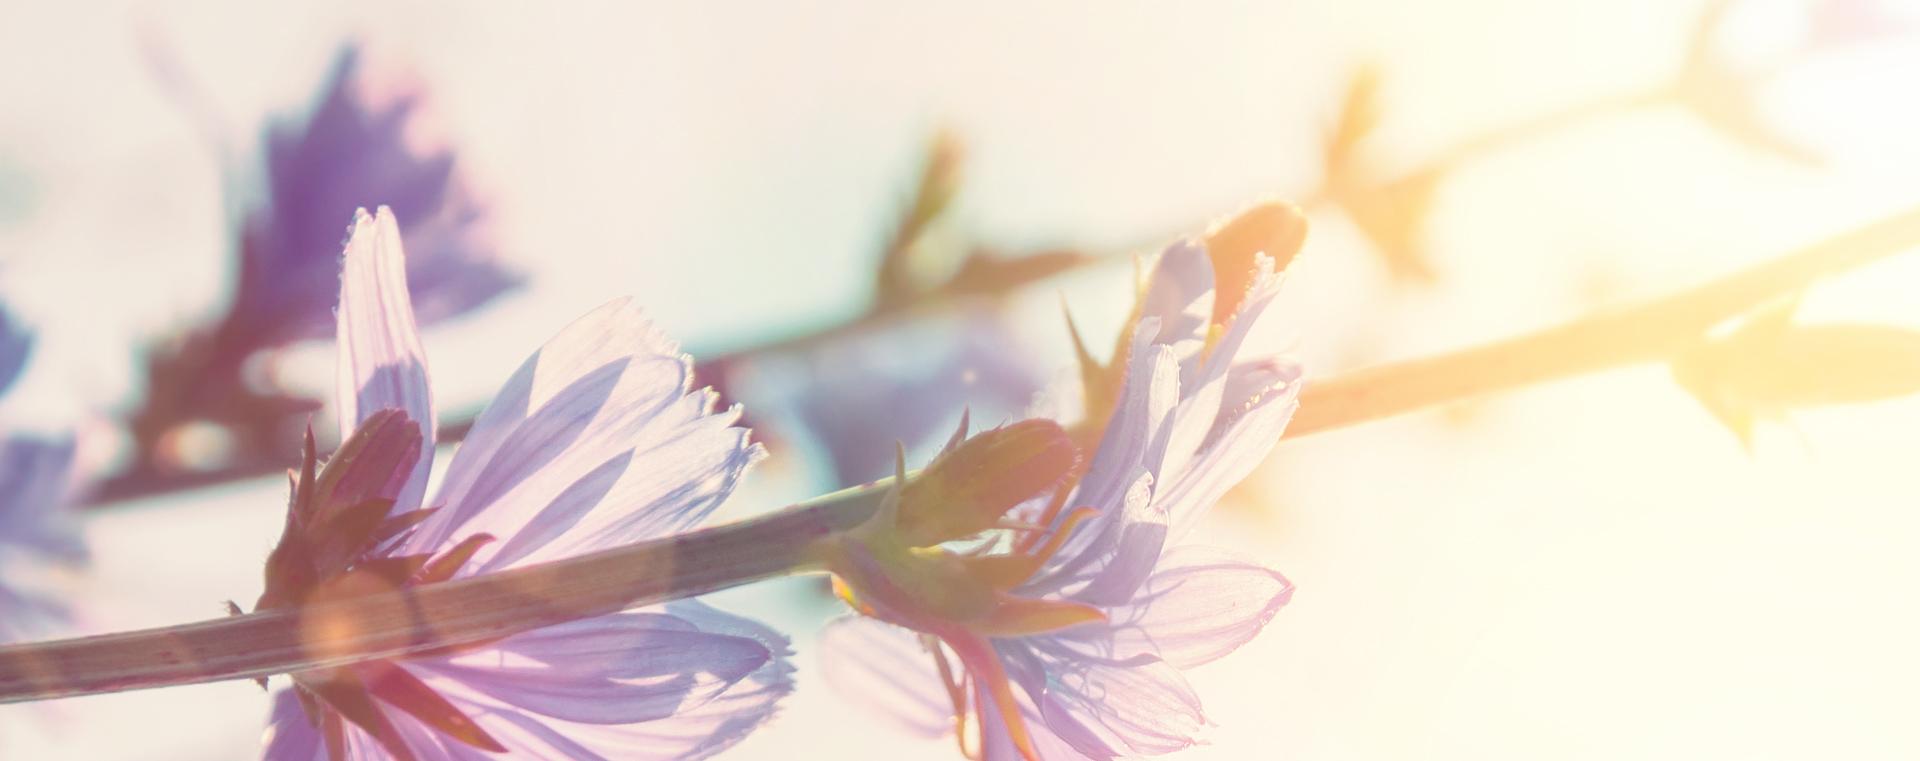 Chicory Wegwarte Überbordende Sorge um Andere Lemon Pharma Original Bachblüten